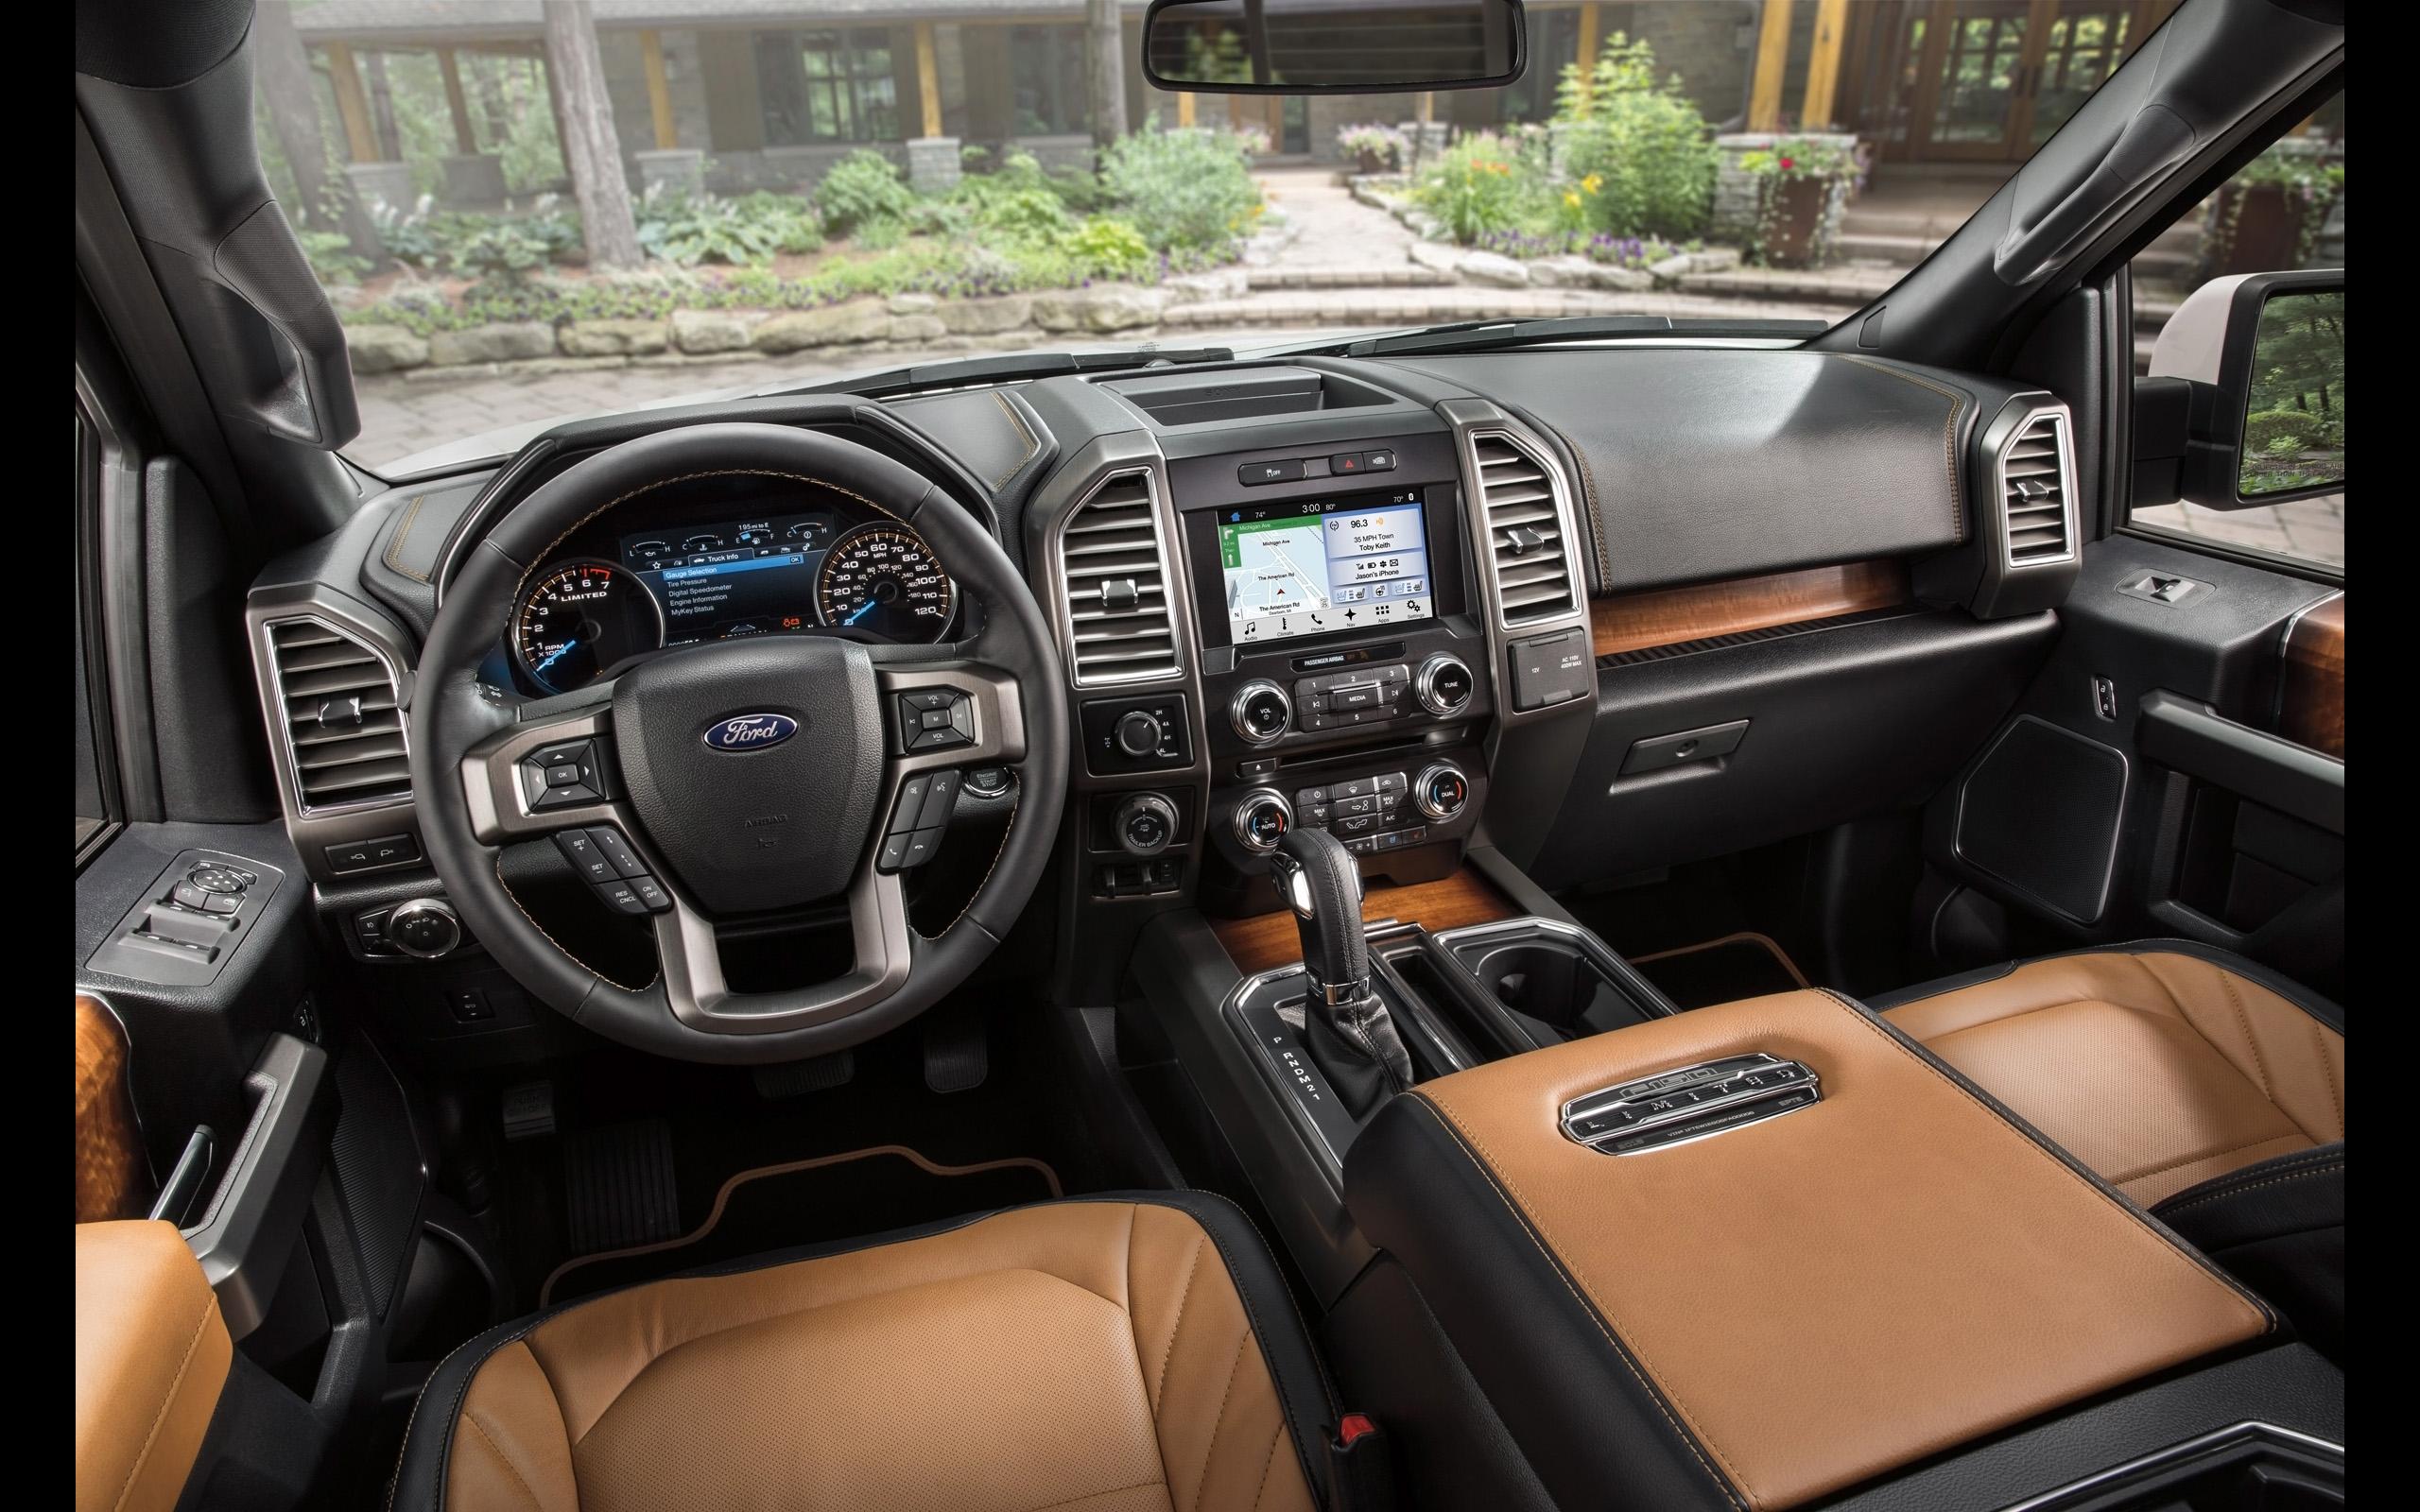 2016 Ford F 150 Limited   Interior   1   2560x1600   Wallpaper 2560x1600